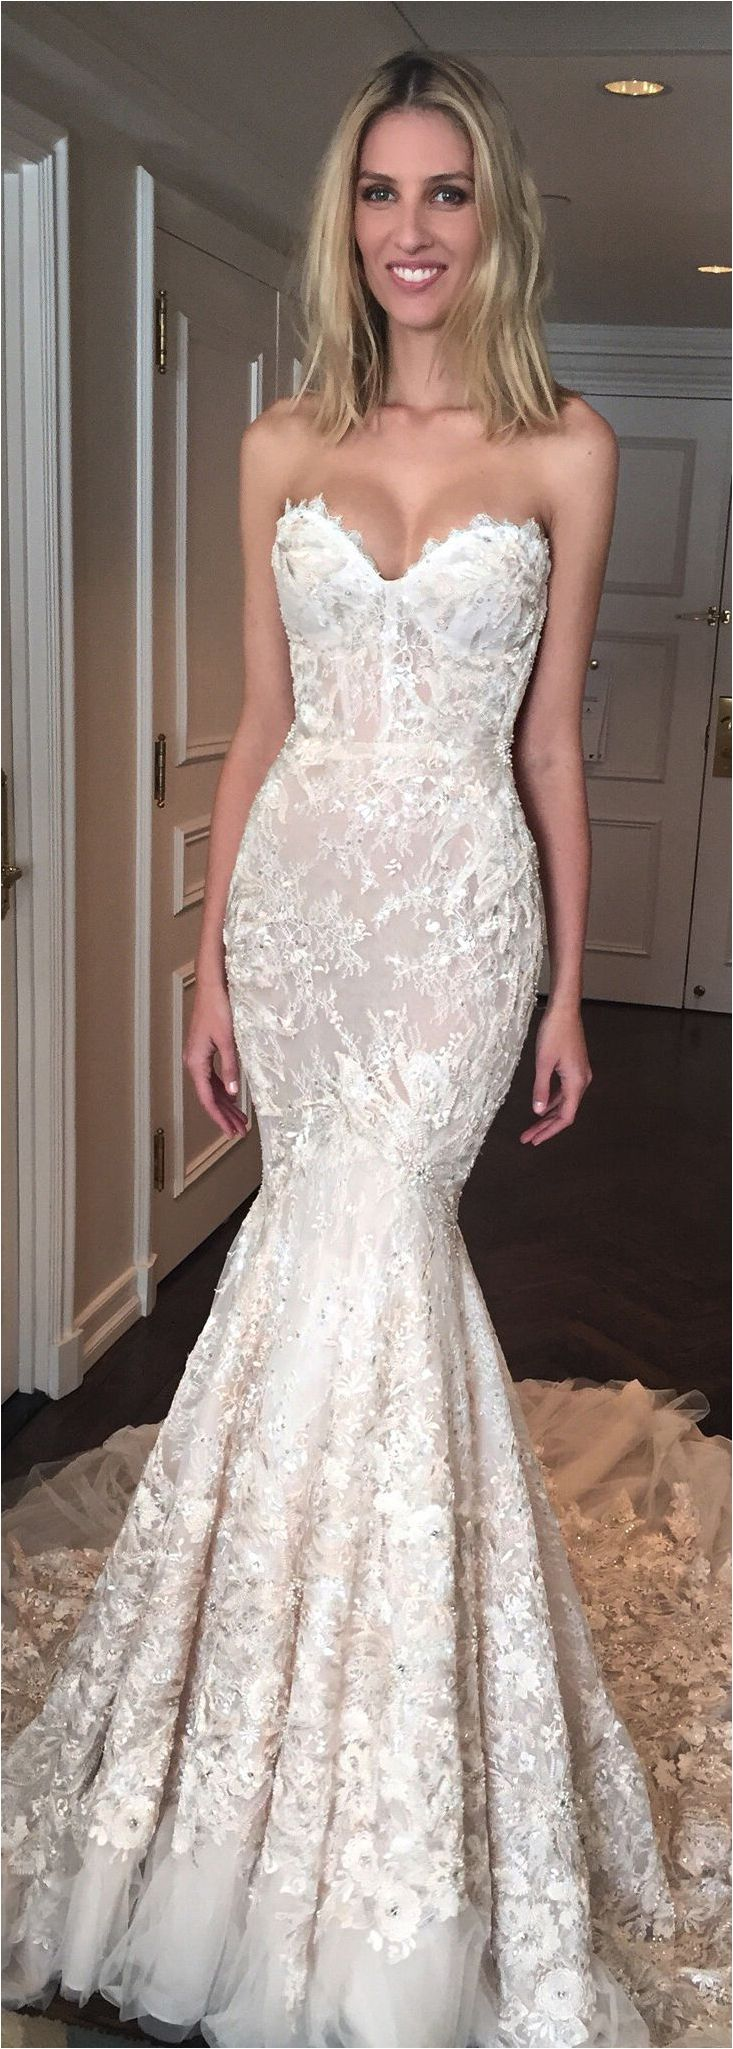 Cute 50+ Elegant Lace Mermaid Wedding Dresses https://bridalore.com/2017/11/10/50-elegant-lace-mermaid-wedding-dresses/